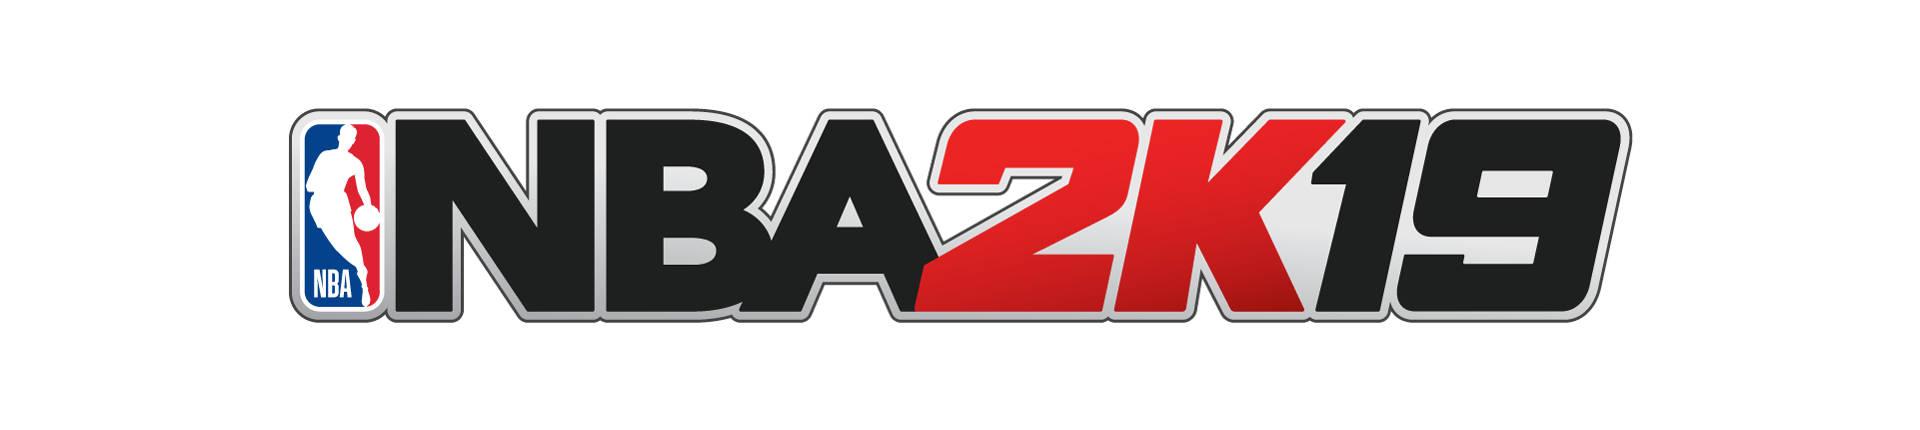 <a href='https://www.mightygamesmag.de/all-game-list/nba-2k19/'>Zum Spiel</a>